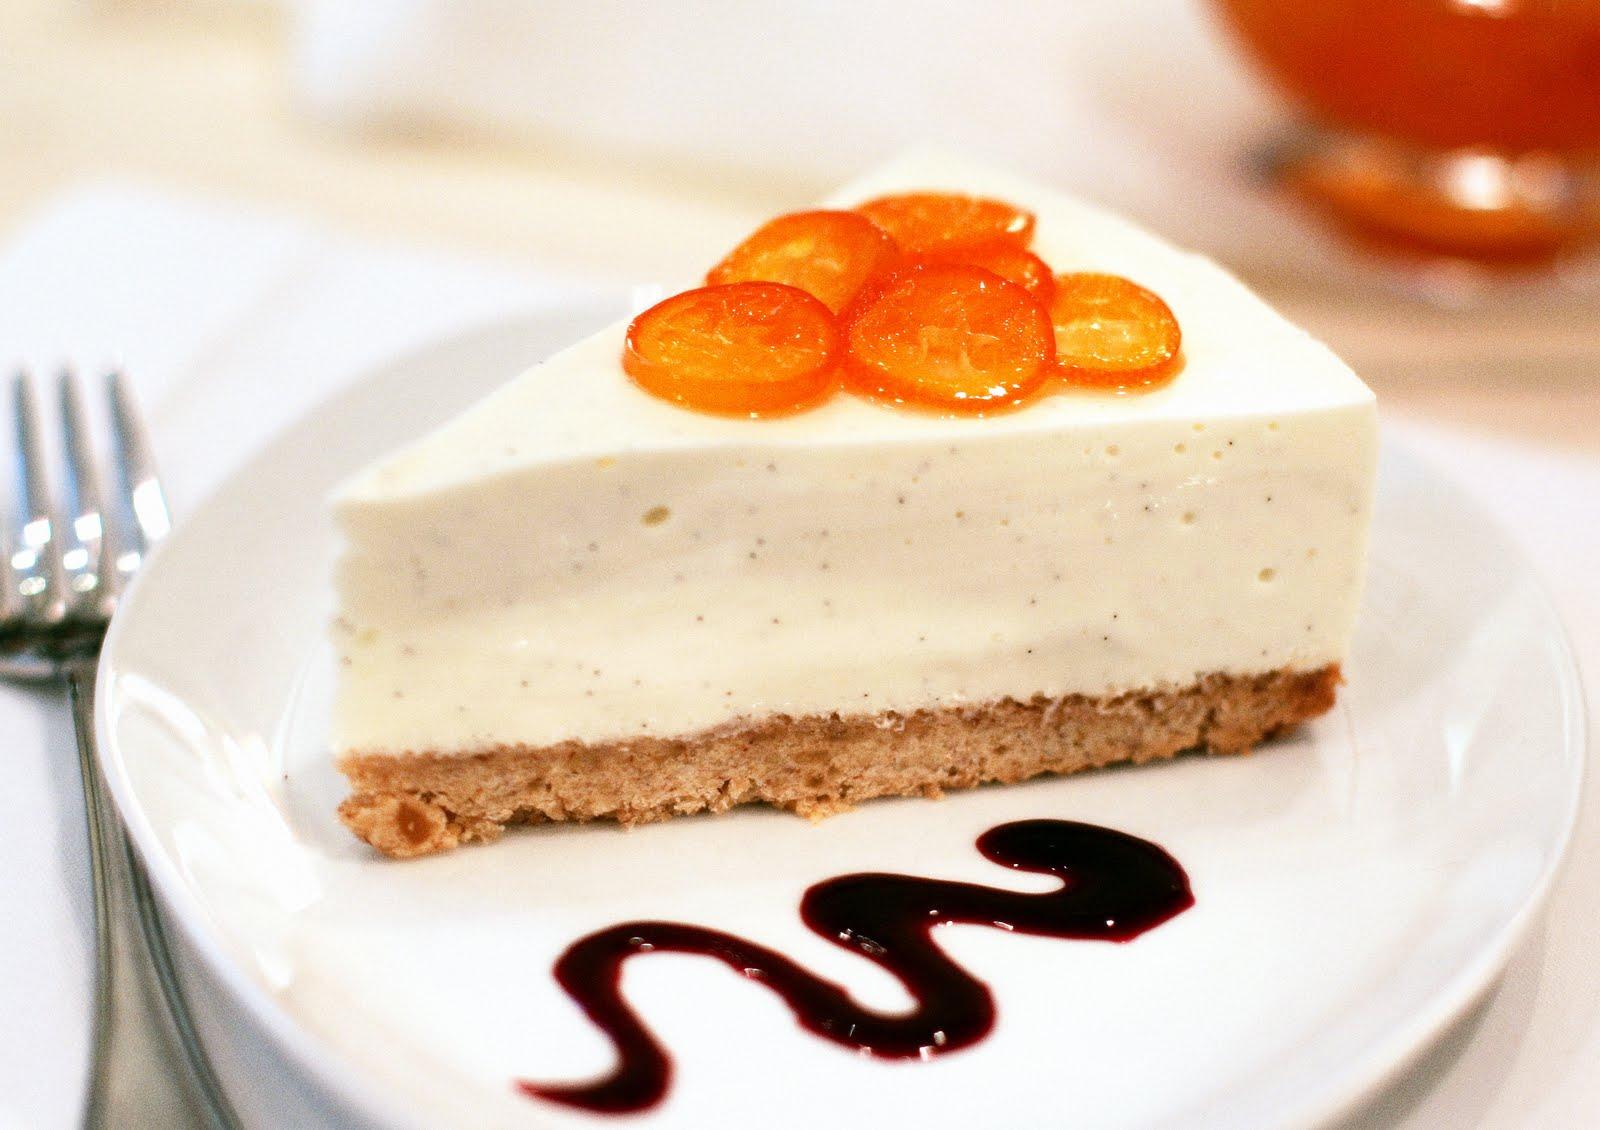 Tish Boyle Sweet Dreams: Whipped Vanilla Bean Cheesecake with Kumquats ...